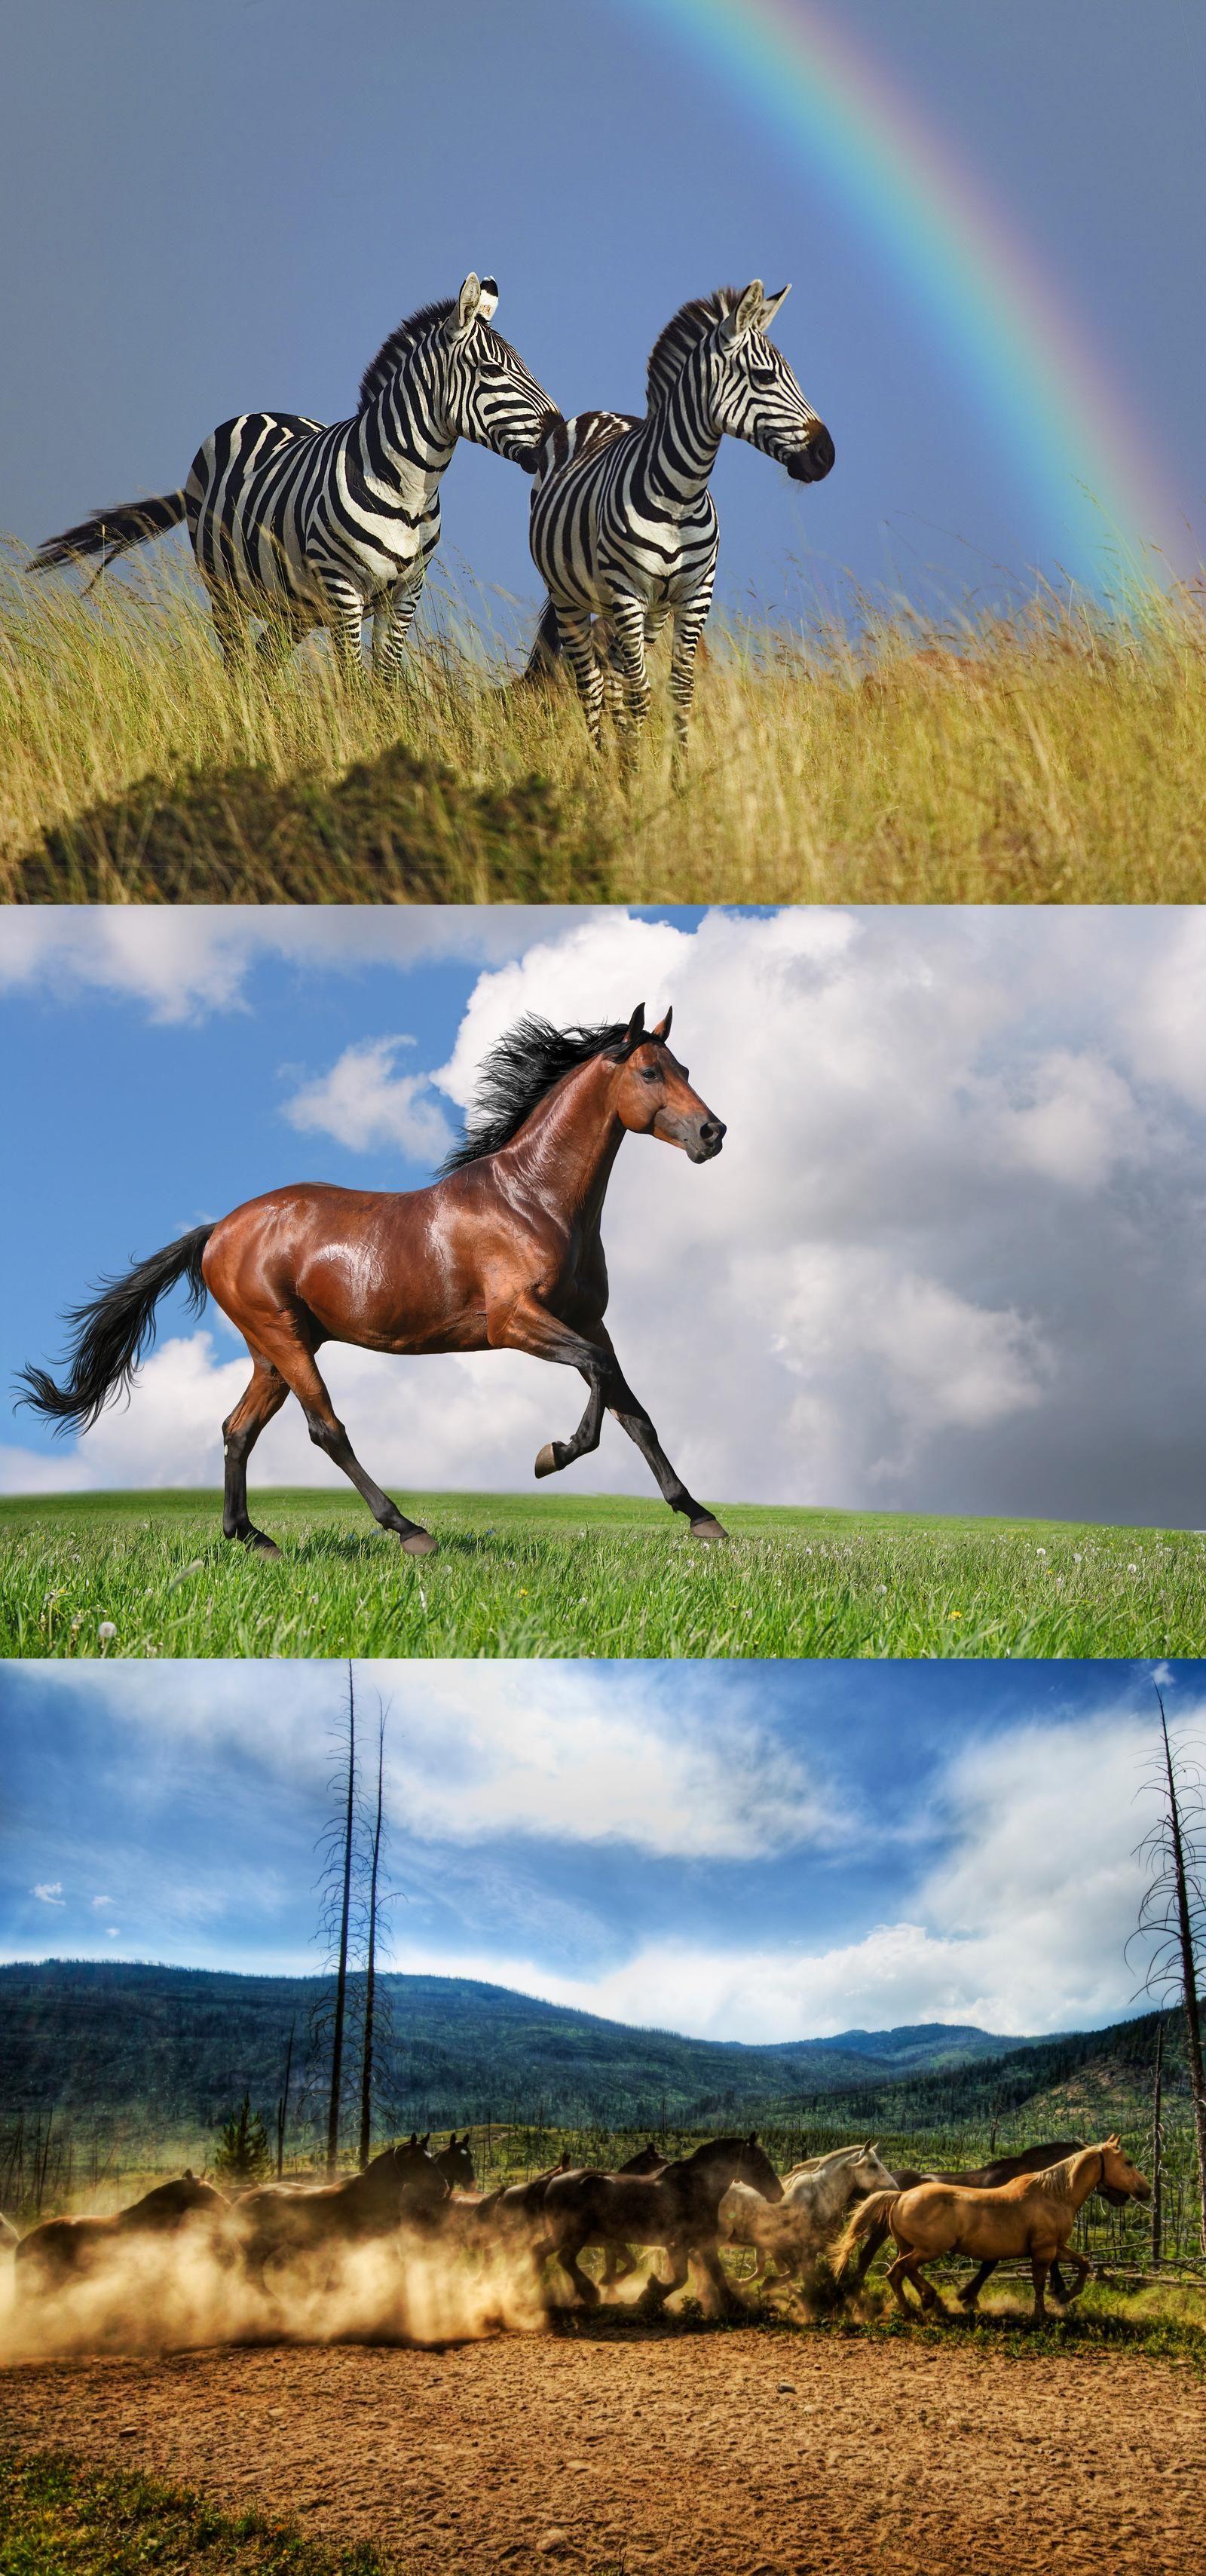 A herd of horses, horse racing